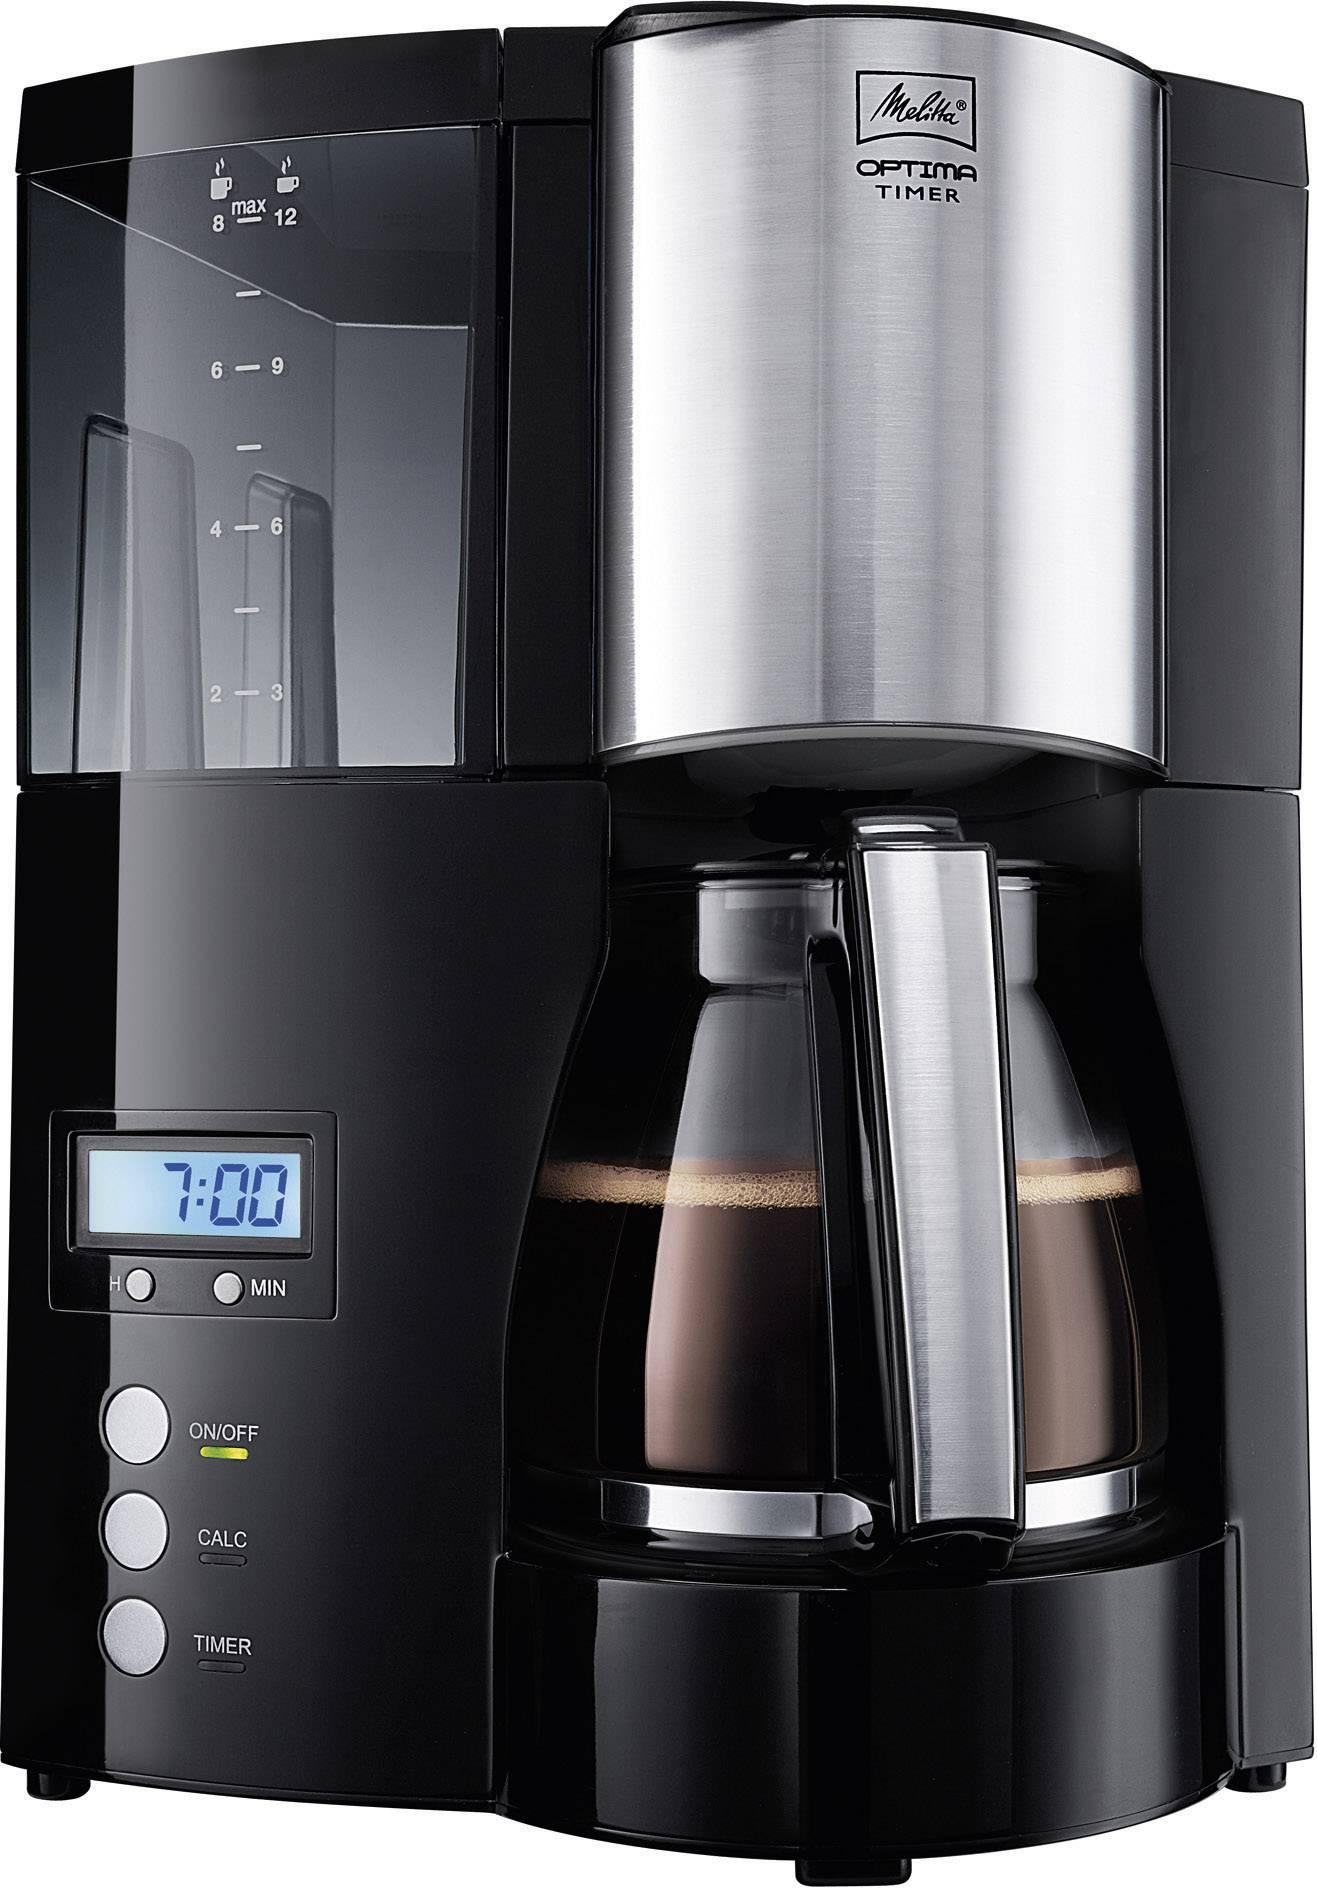 Melitta Optima Timer Black Coffee Maker Black 850 W Cup Volume12 Timer